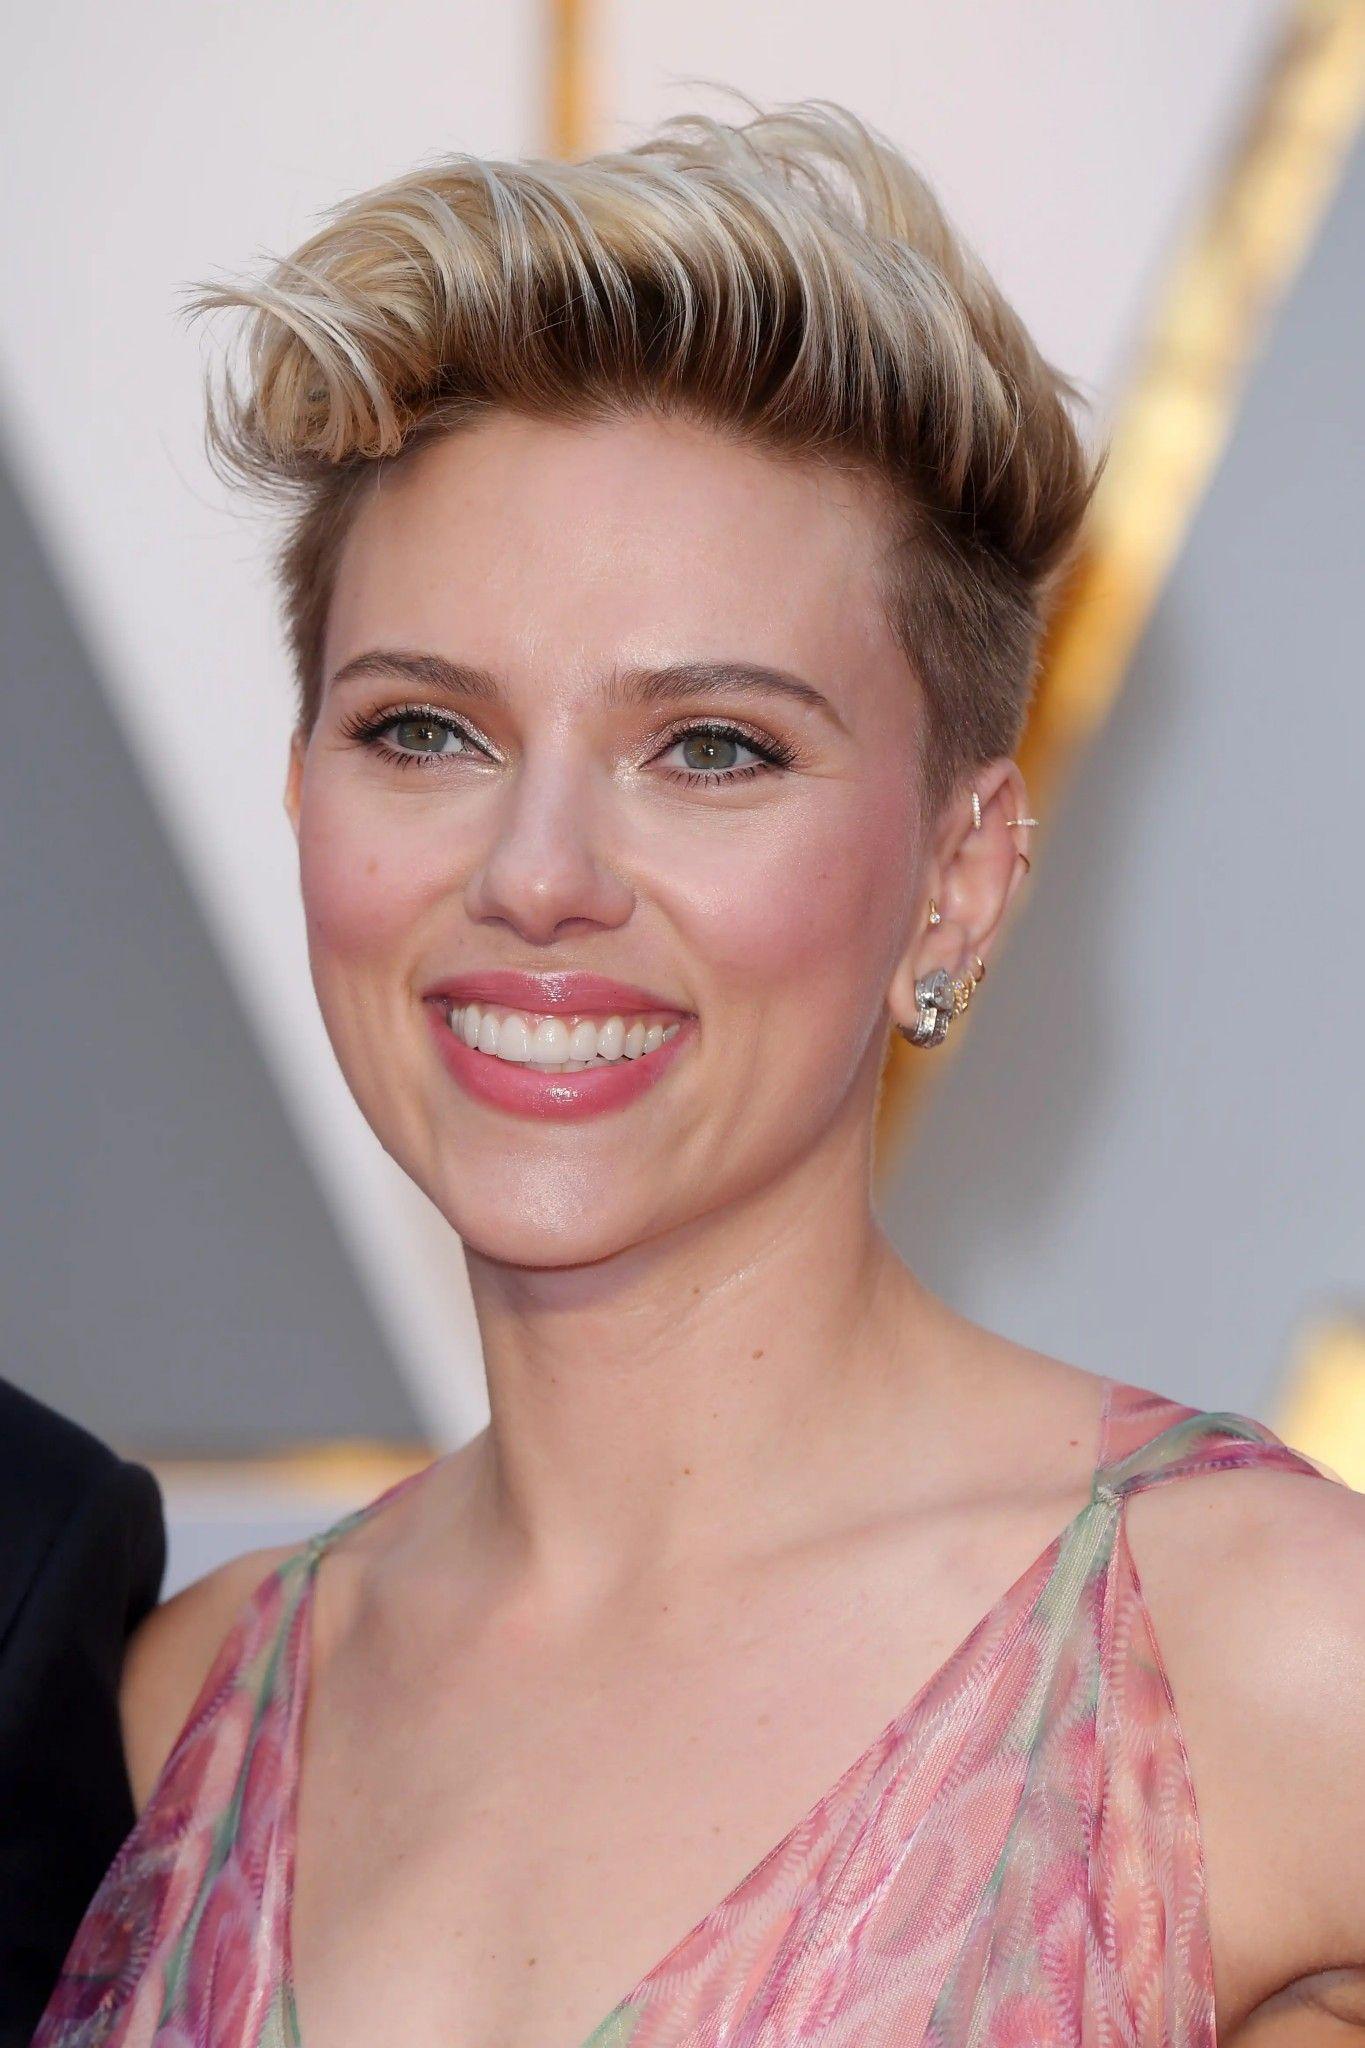 Scarlett Johansson attends the 89th Annual Academy Awards